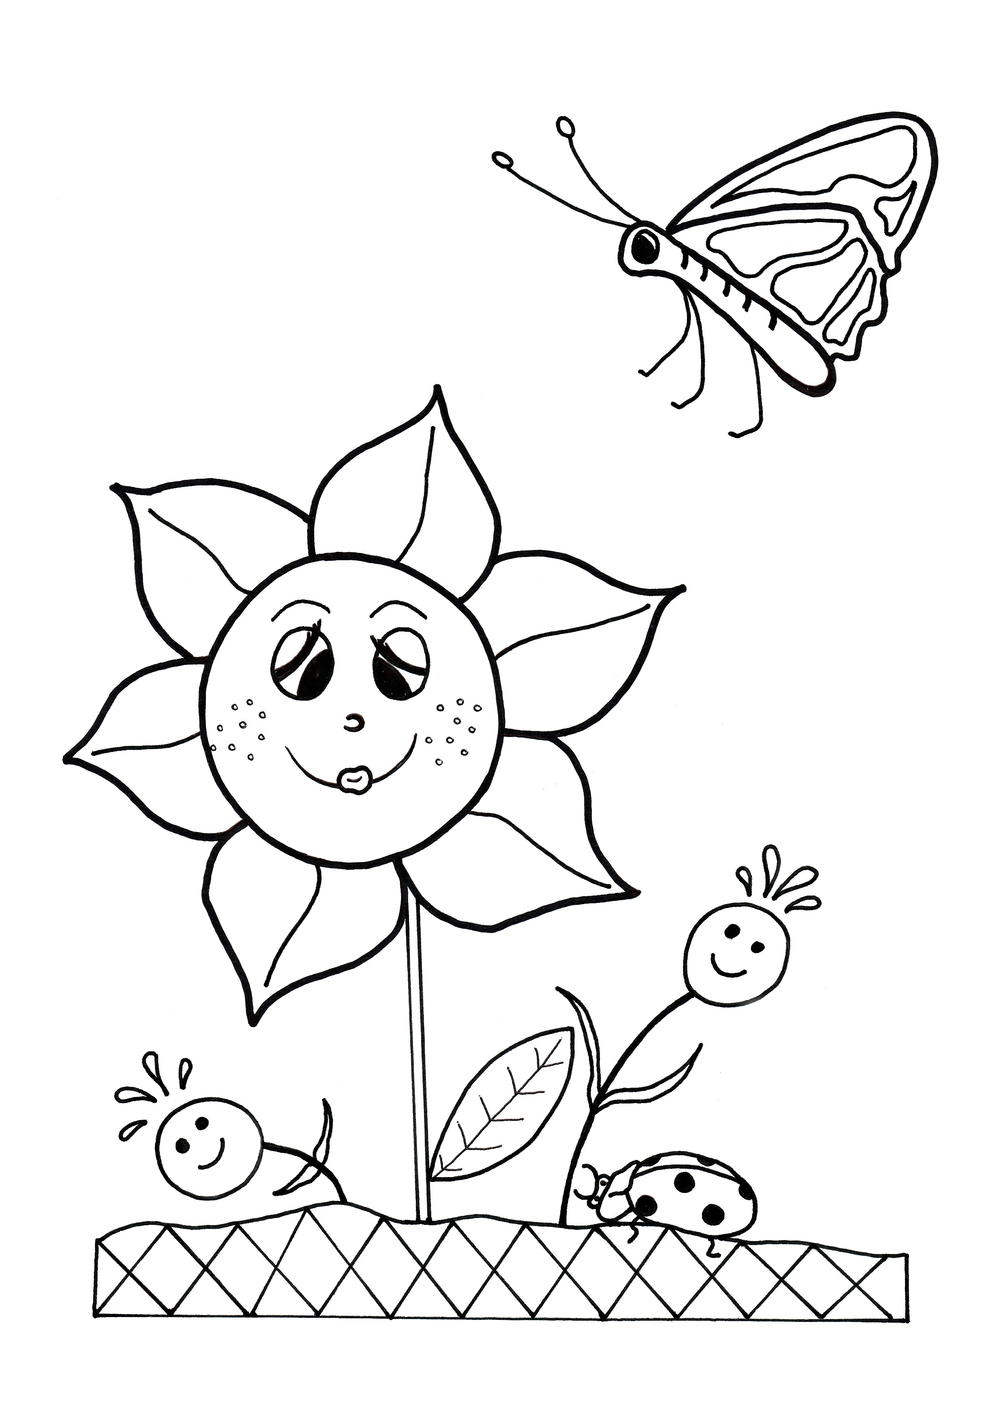 Dancing Flowers Spring Coloring Sheet | AllFreeKidsCrafts.com | spring flower coloring pages